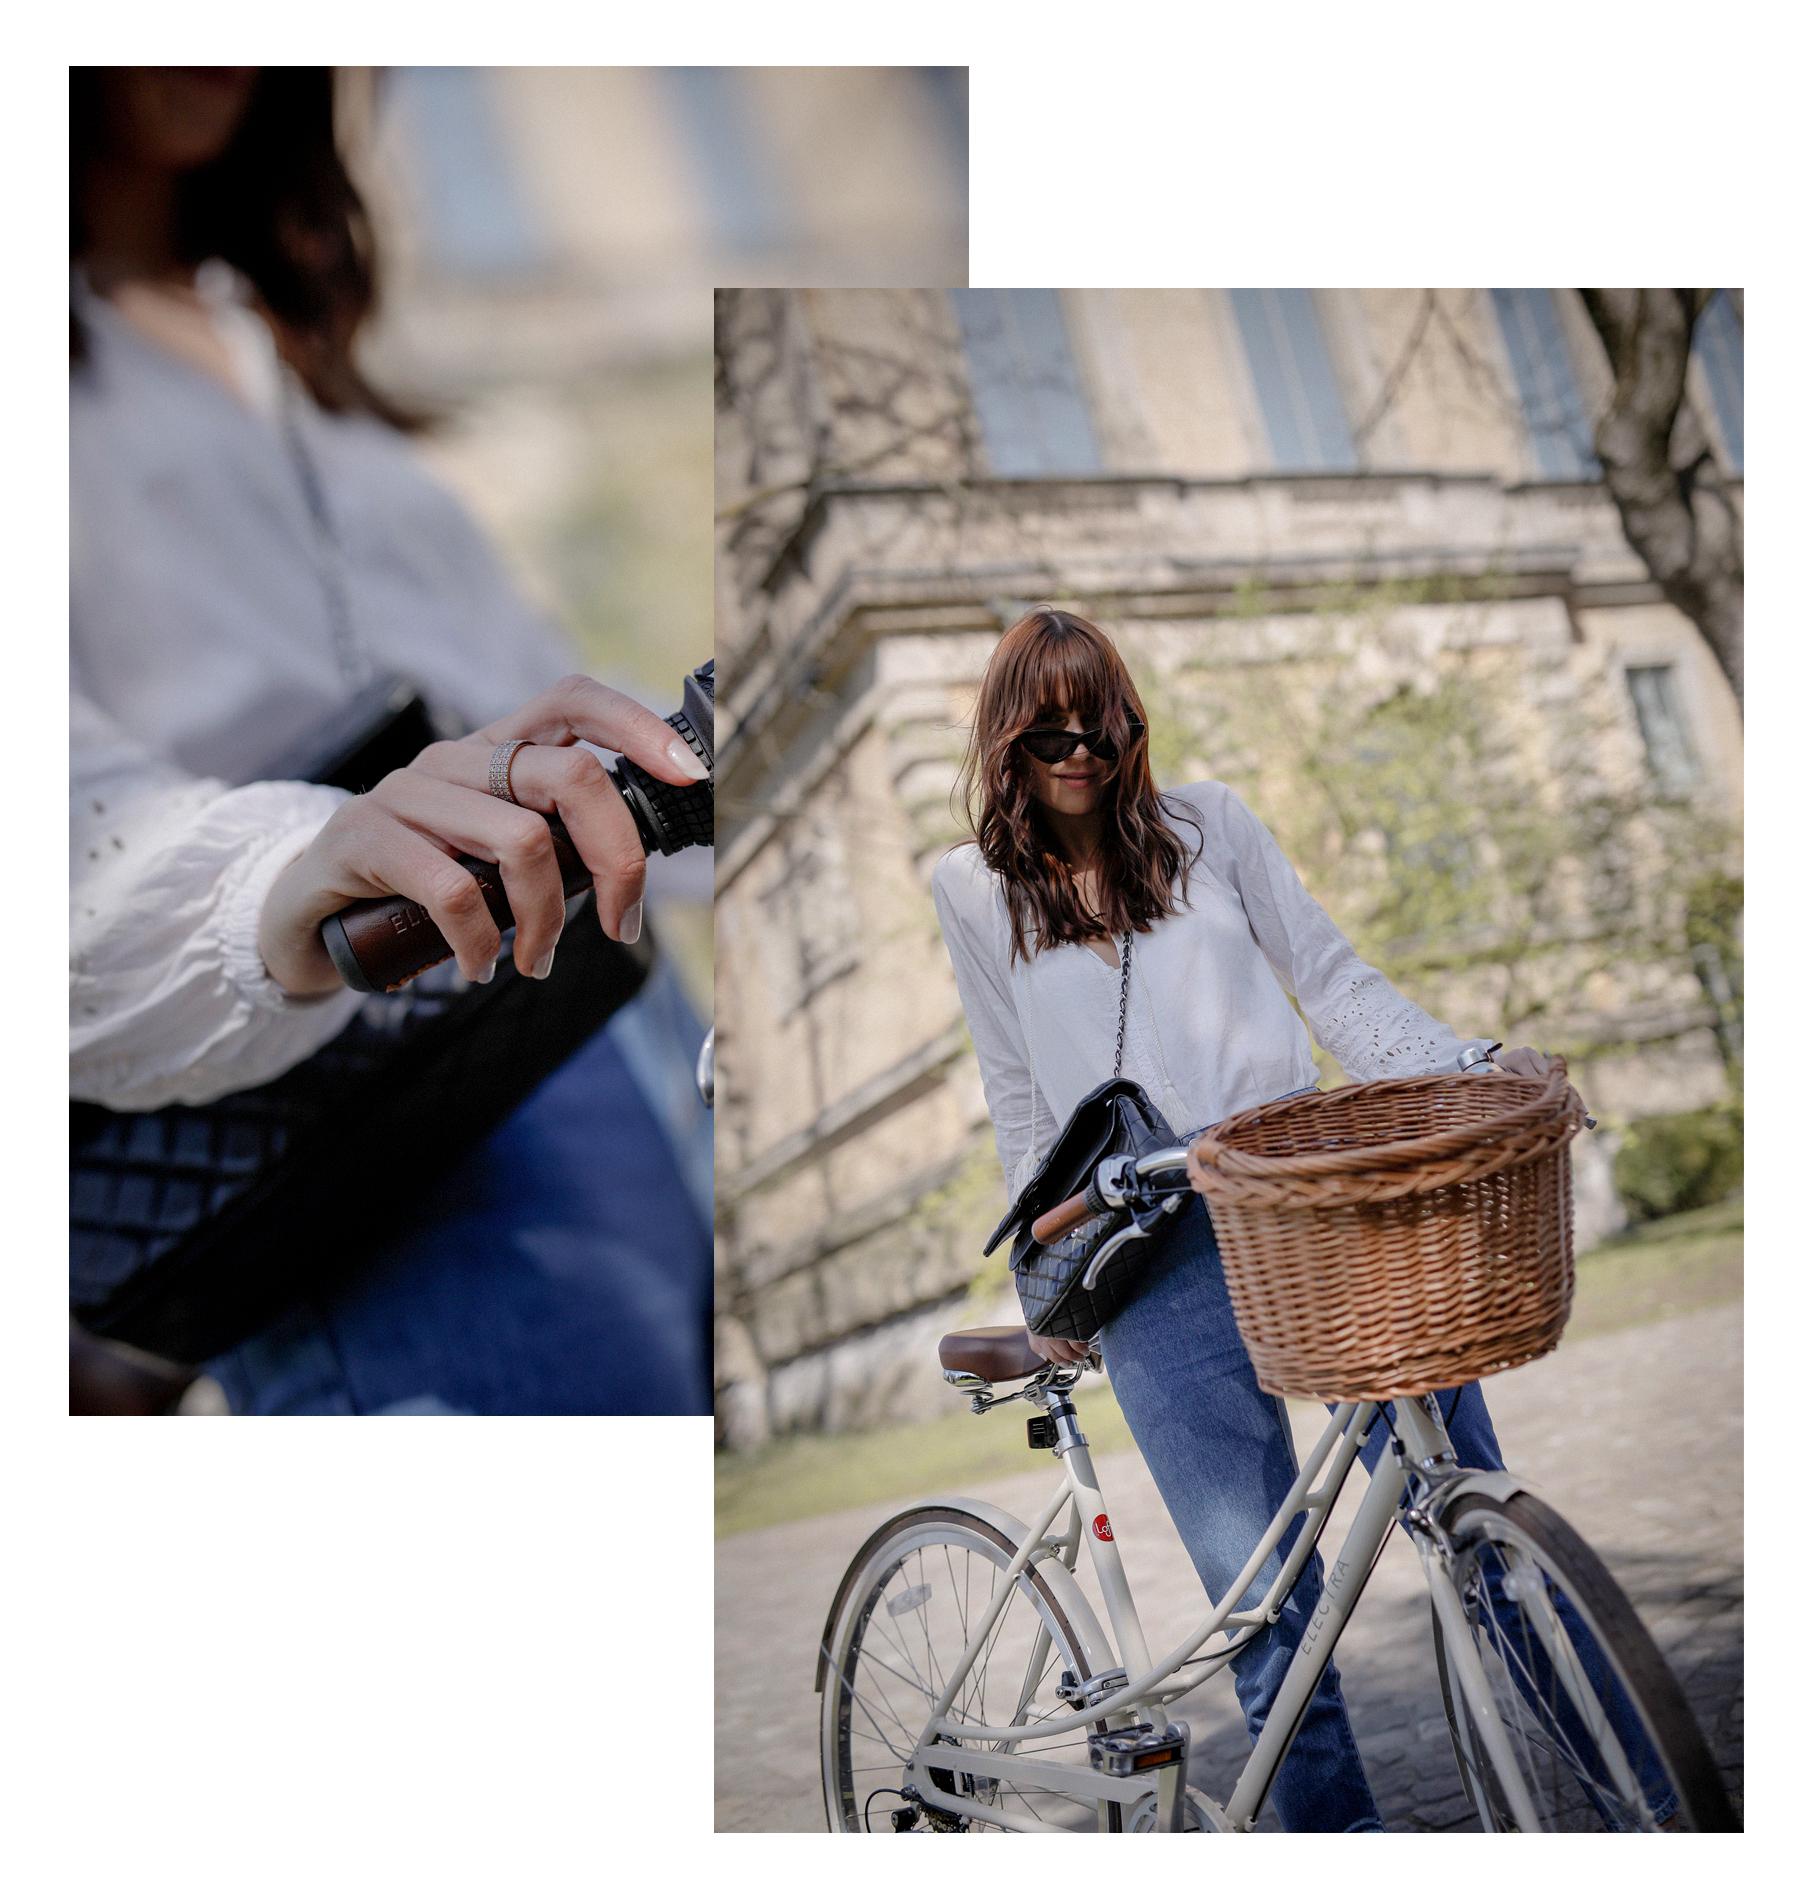 electra bike bicycle fahrrad spring frühling radeln biking loft 7d creme electrabikes catsanddogsblog ricarda schernus modeblog lifestyle blogger styleblog lifestyleblog cats&dogs styleblogger max bechmann fotografie film düsseldorf 2